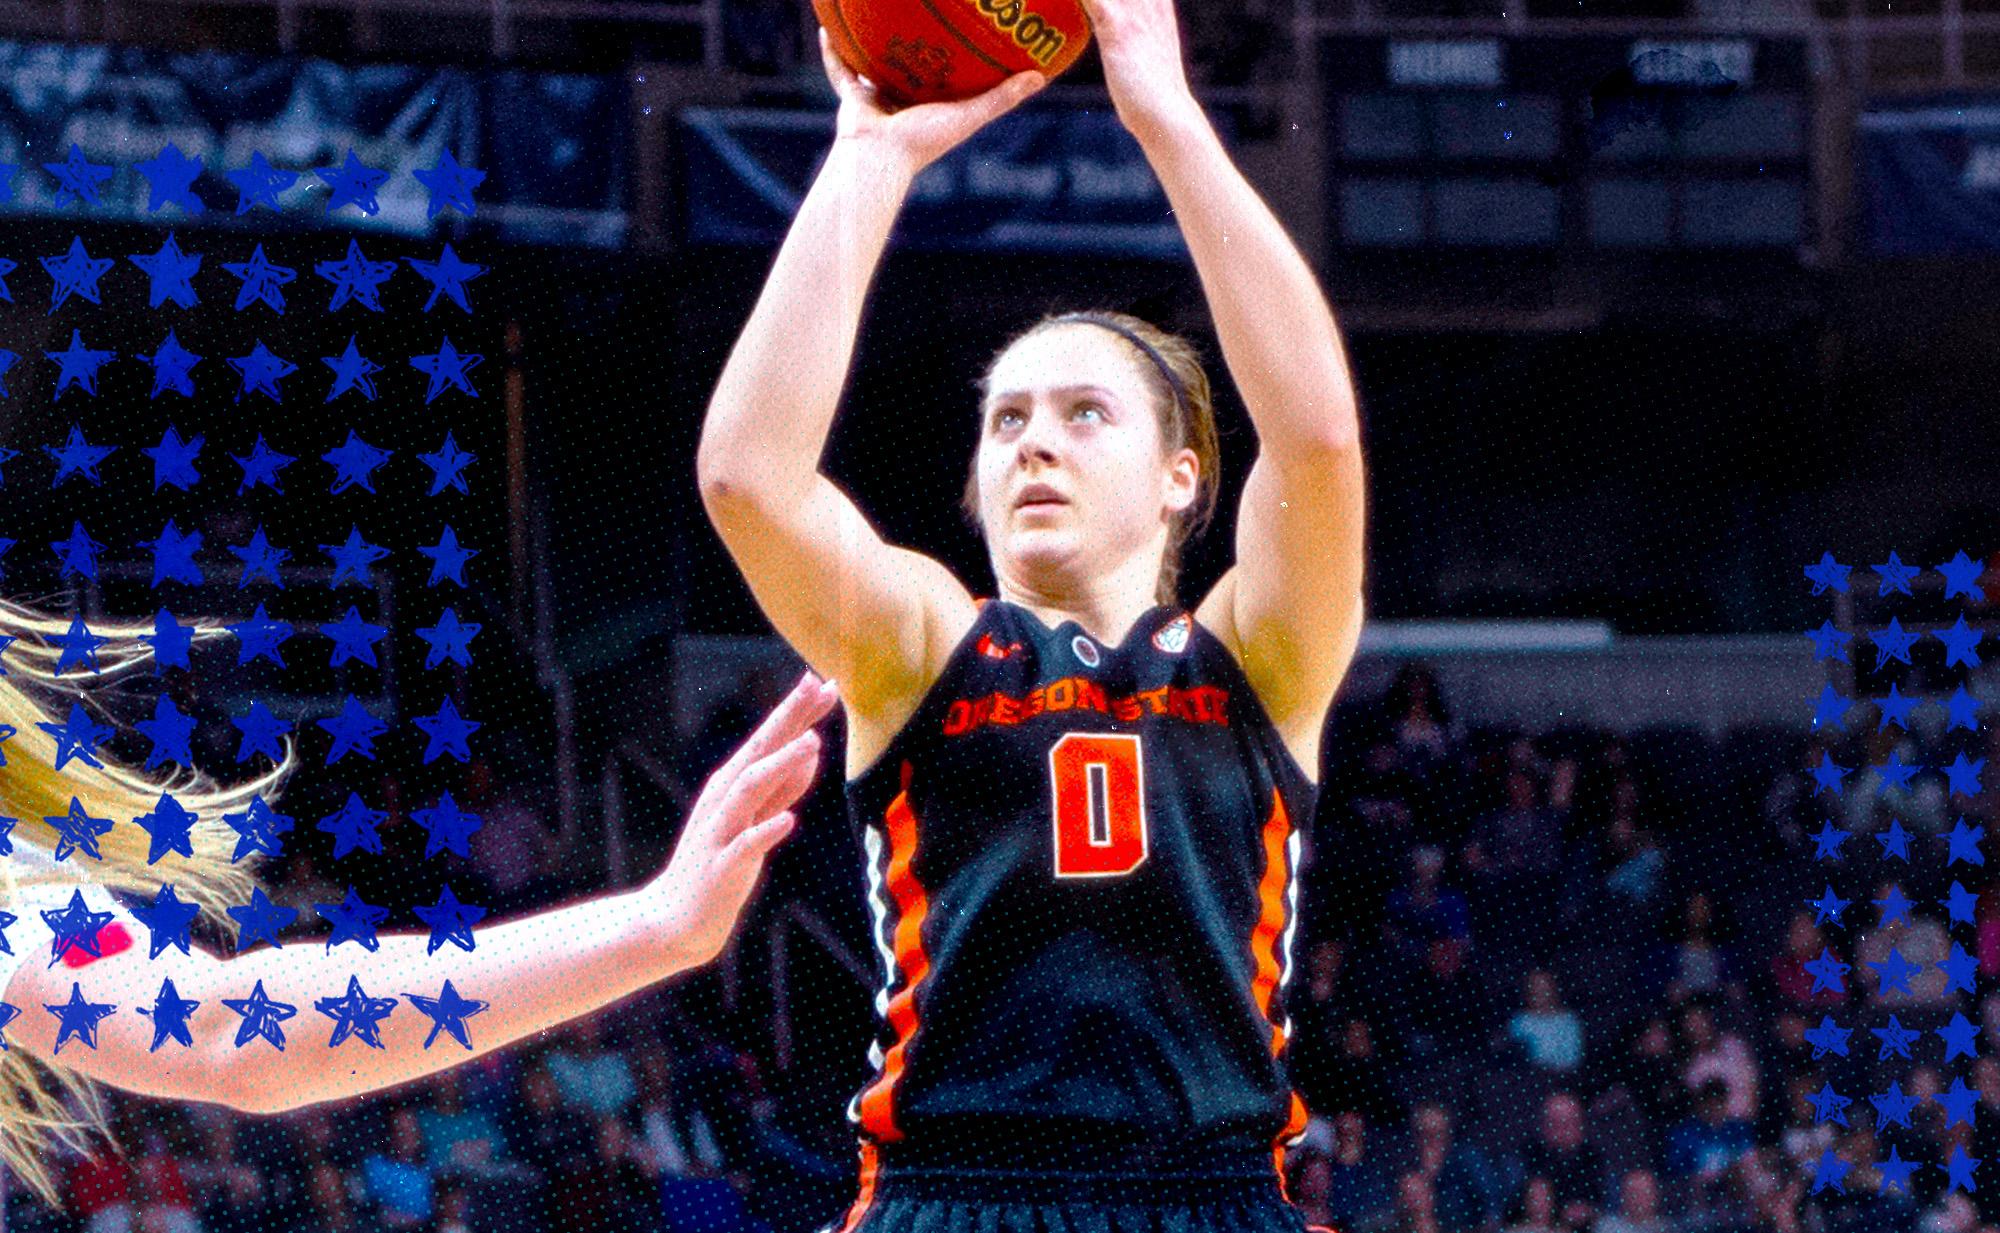 Oregon State Beavers Guard Mikayla Pivec shoots a jump shot